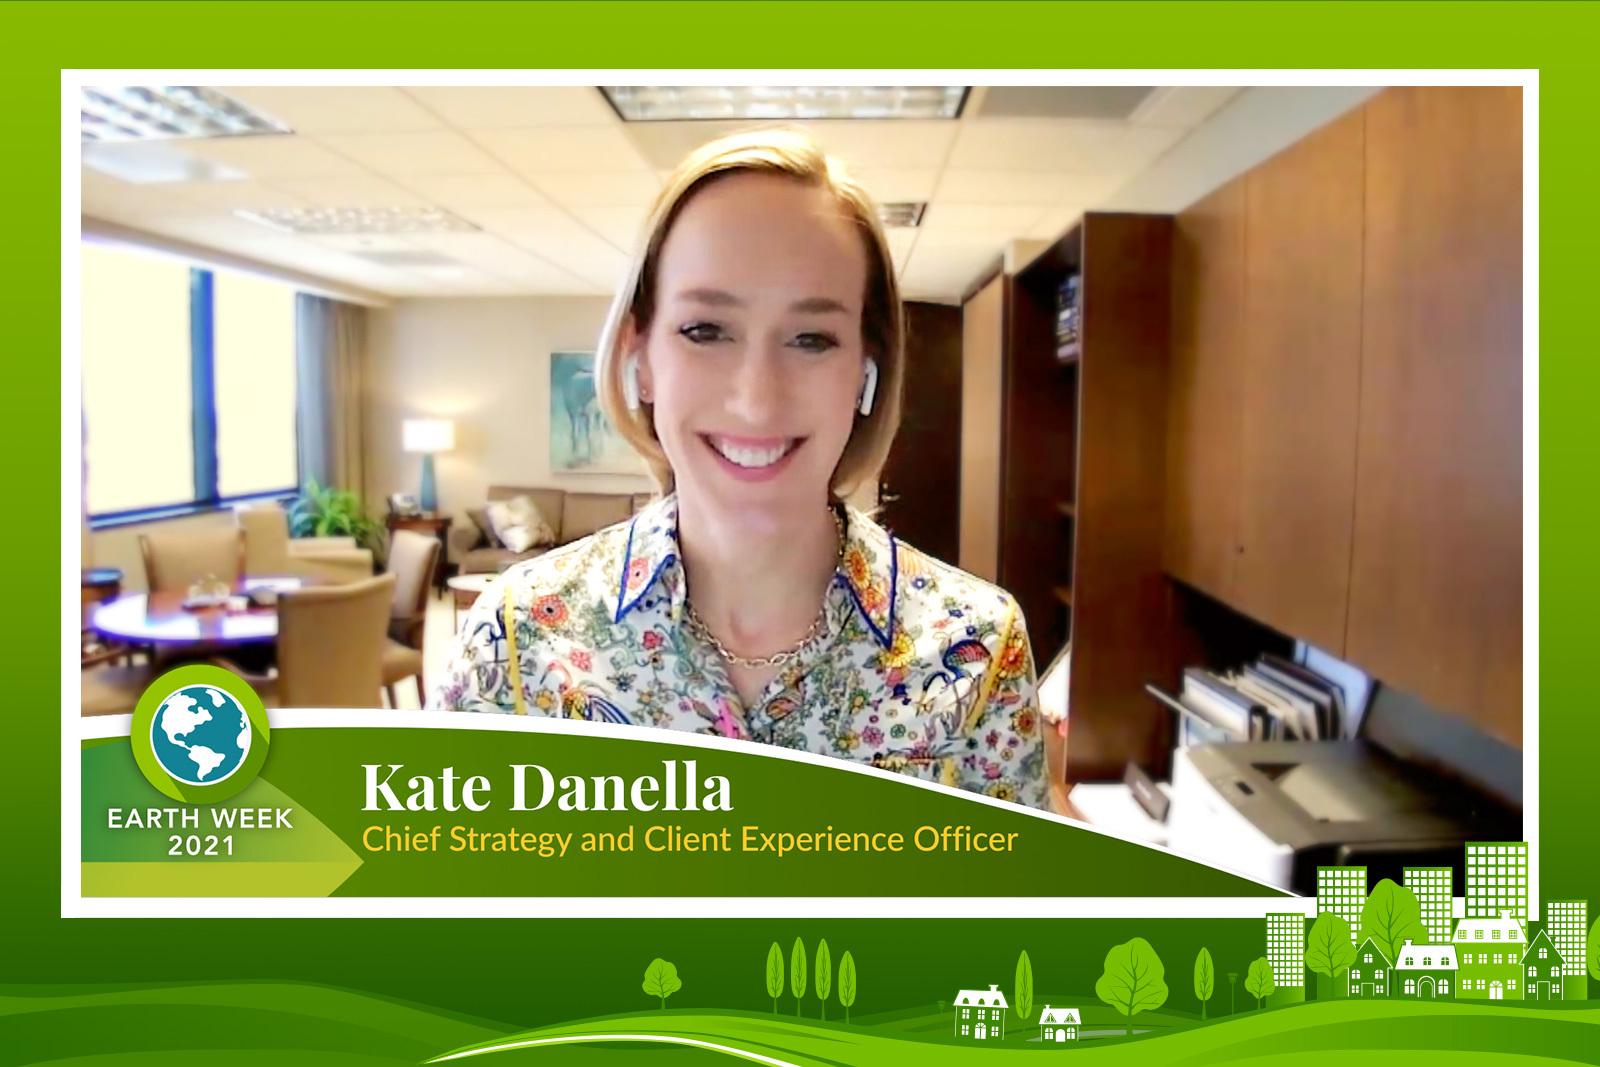 Kate Danella - Earth Week 2021